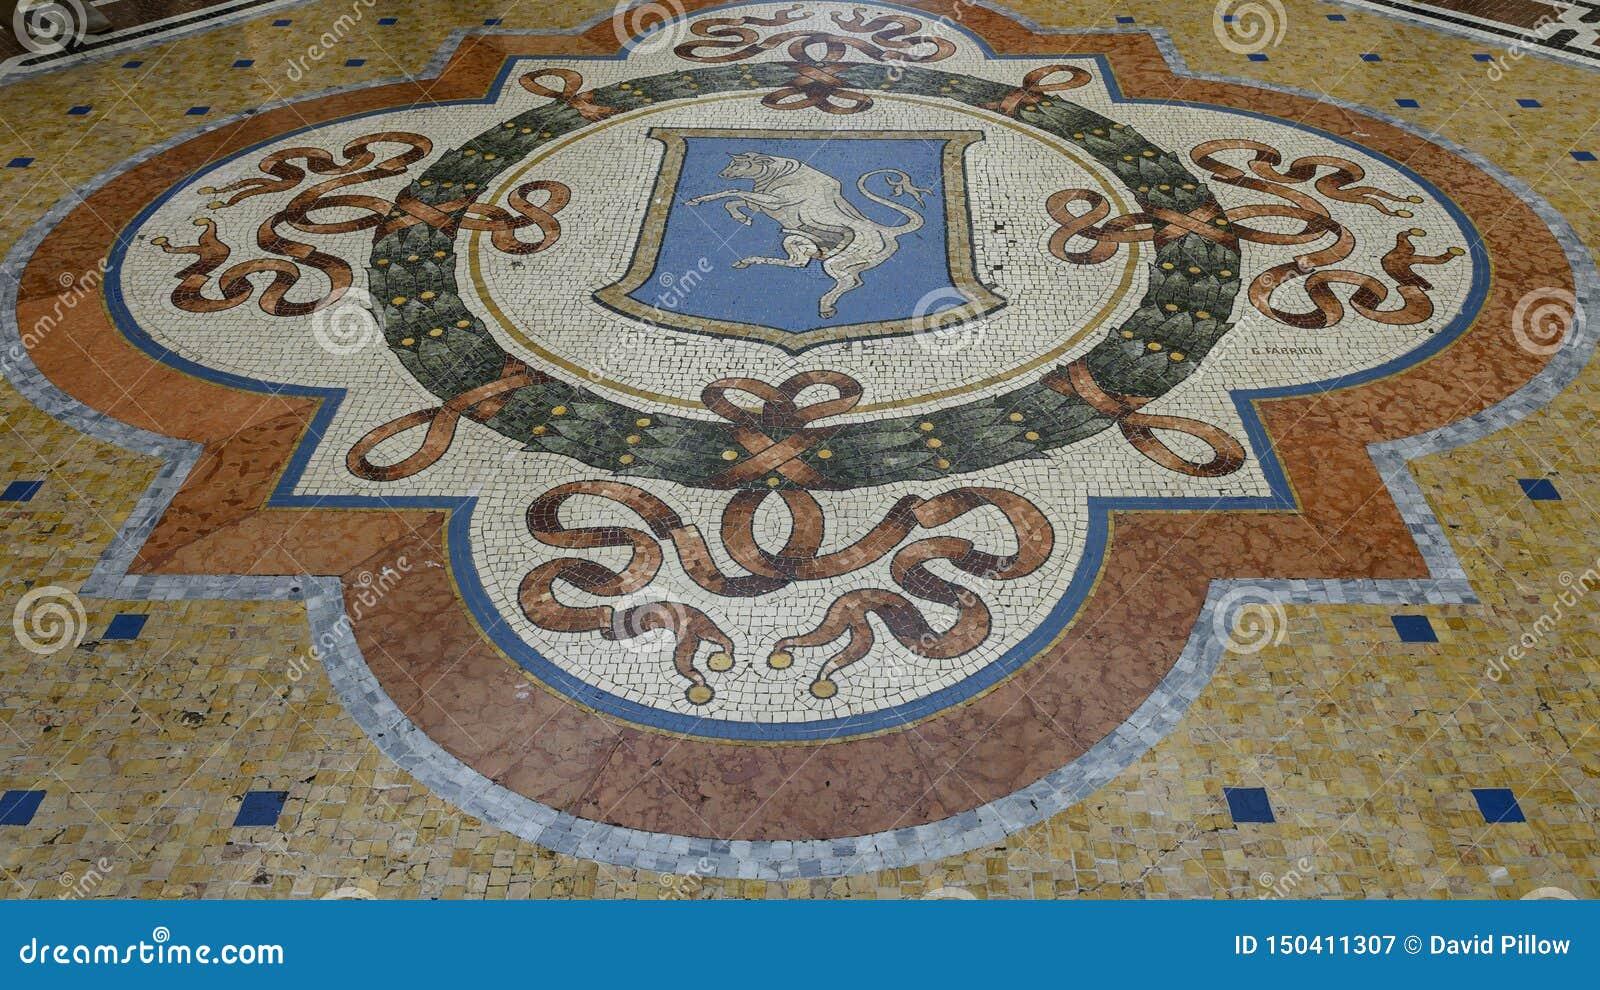 Mosiac του Bull του Τορίνου στο κέντρο του Galleria Vittorio Emanuele ΙΙ παλαιότερη λεωφόρος αγορών του Μιλάνου, Ιταλίας